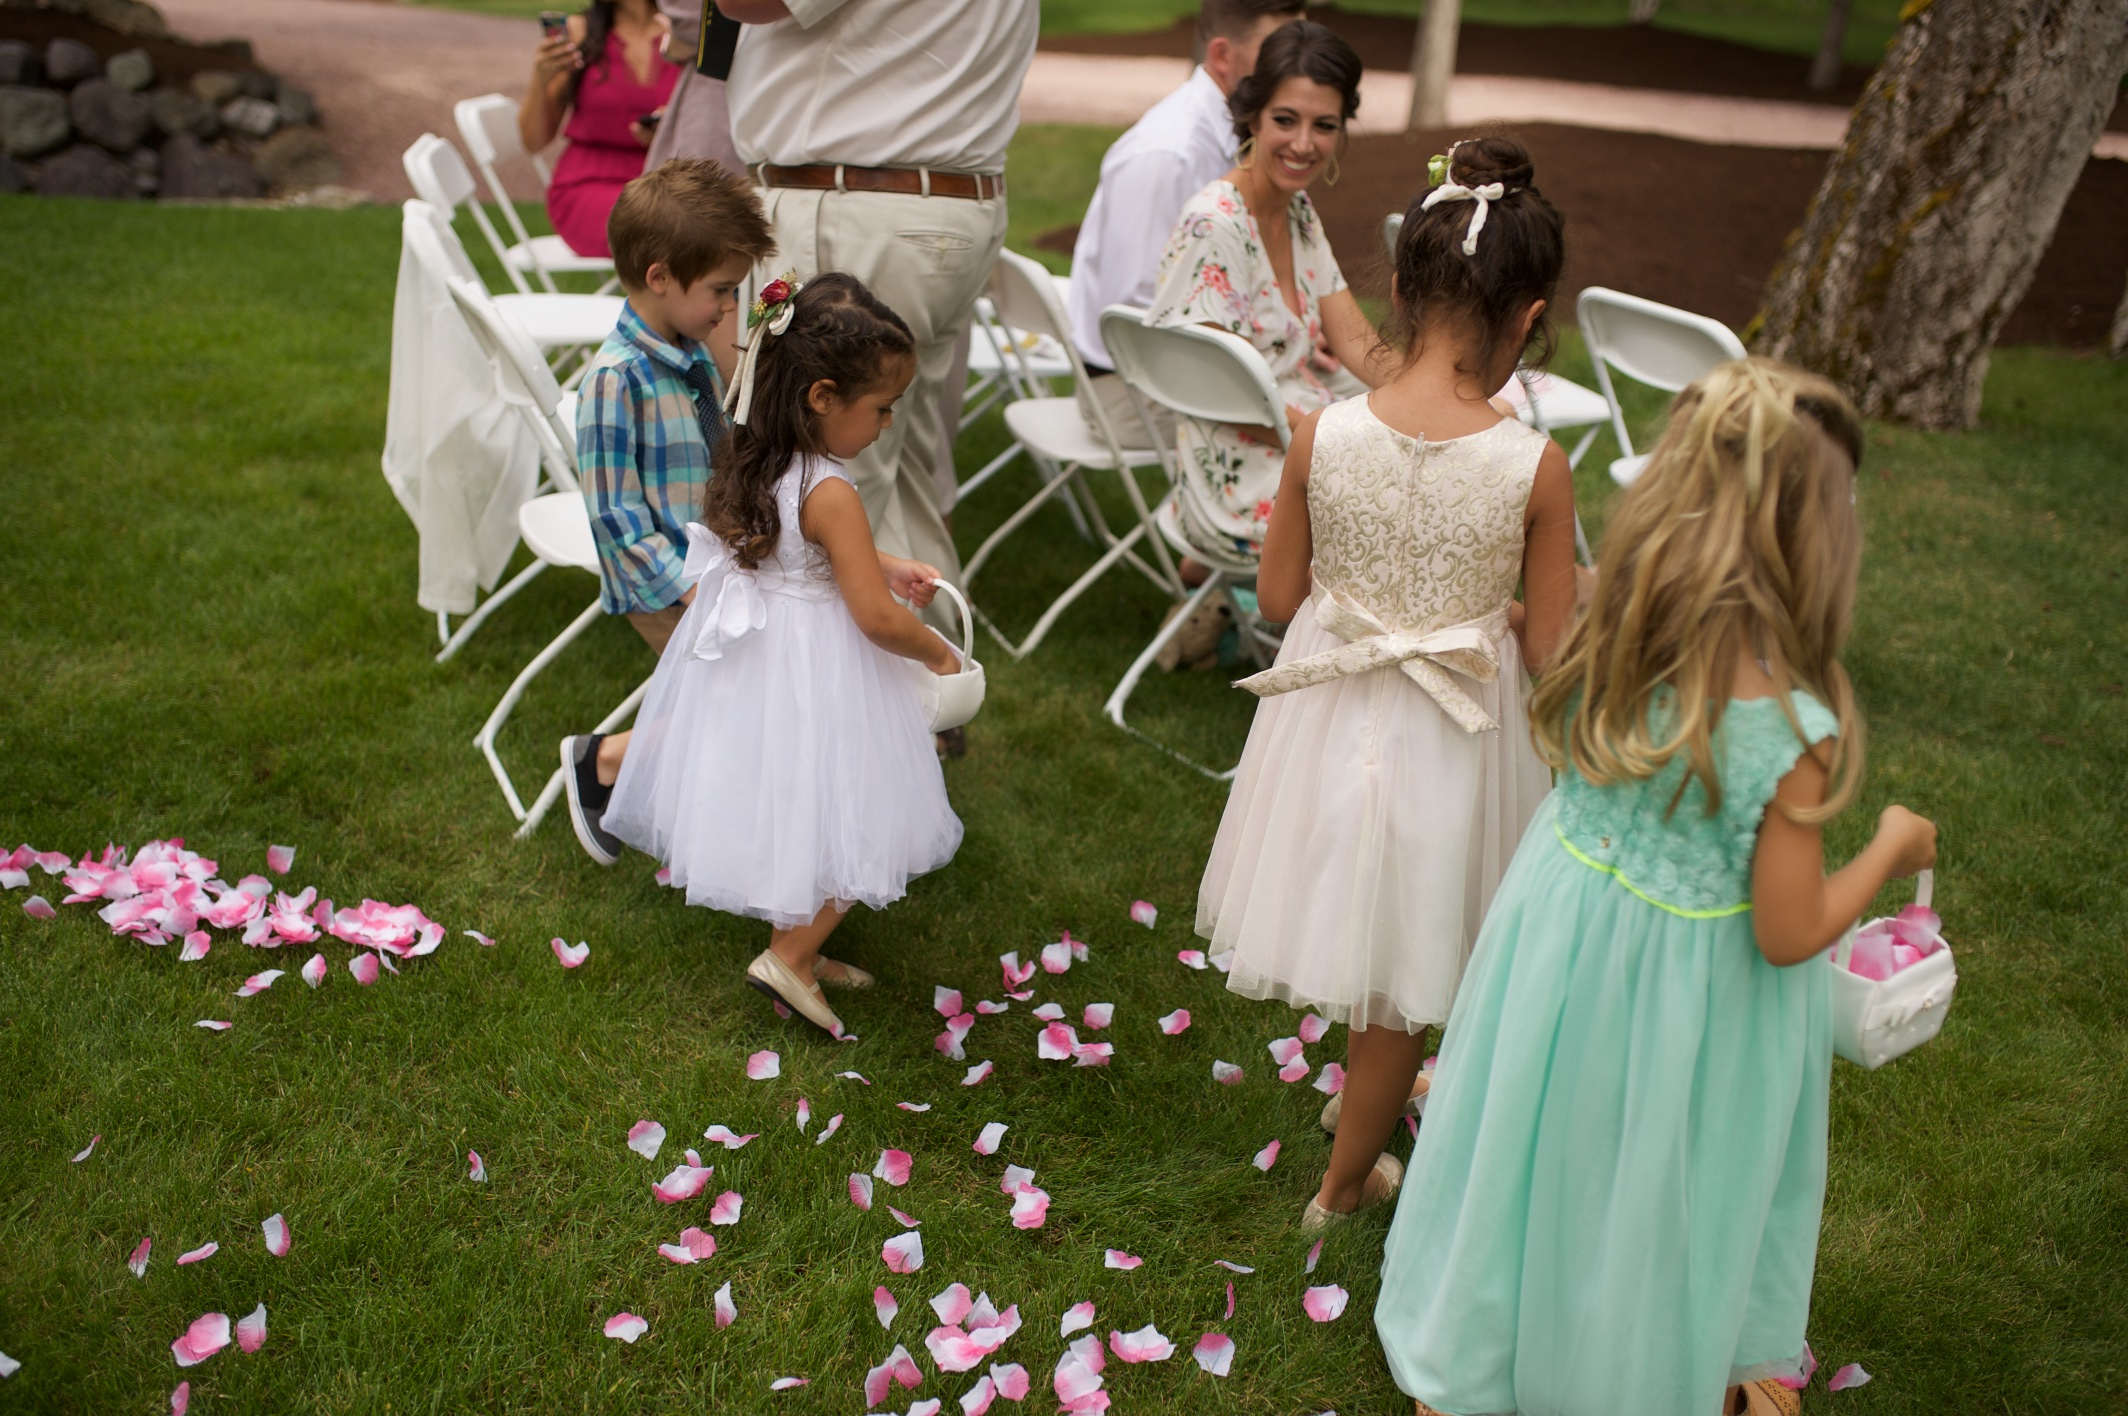 lindseyjane_wedding020.jpg